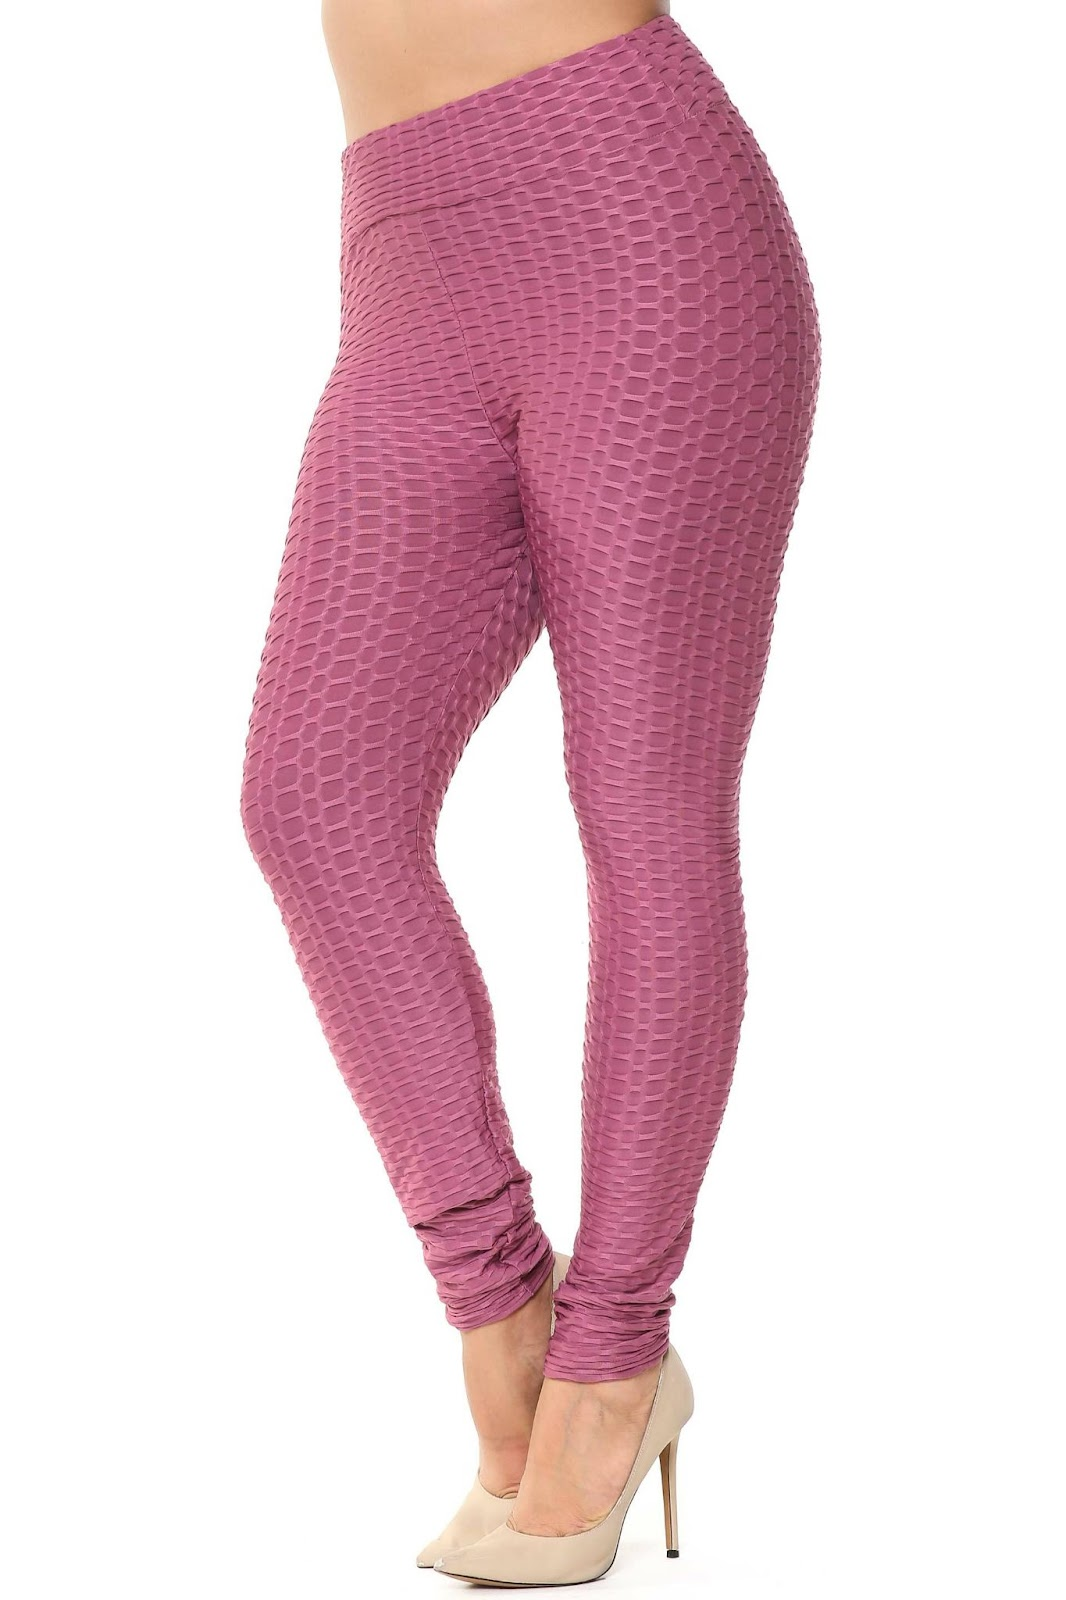 where to buy wholesale leggings